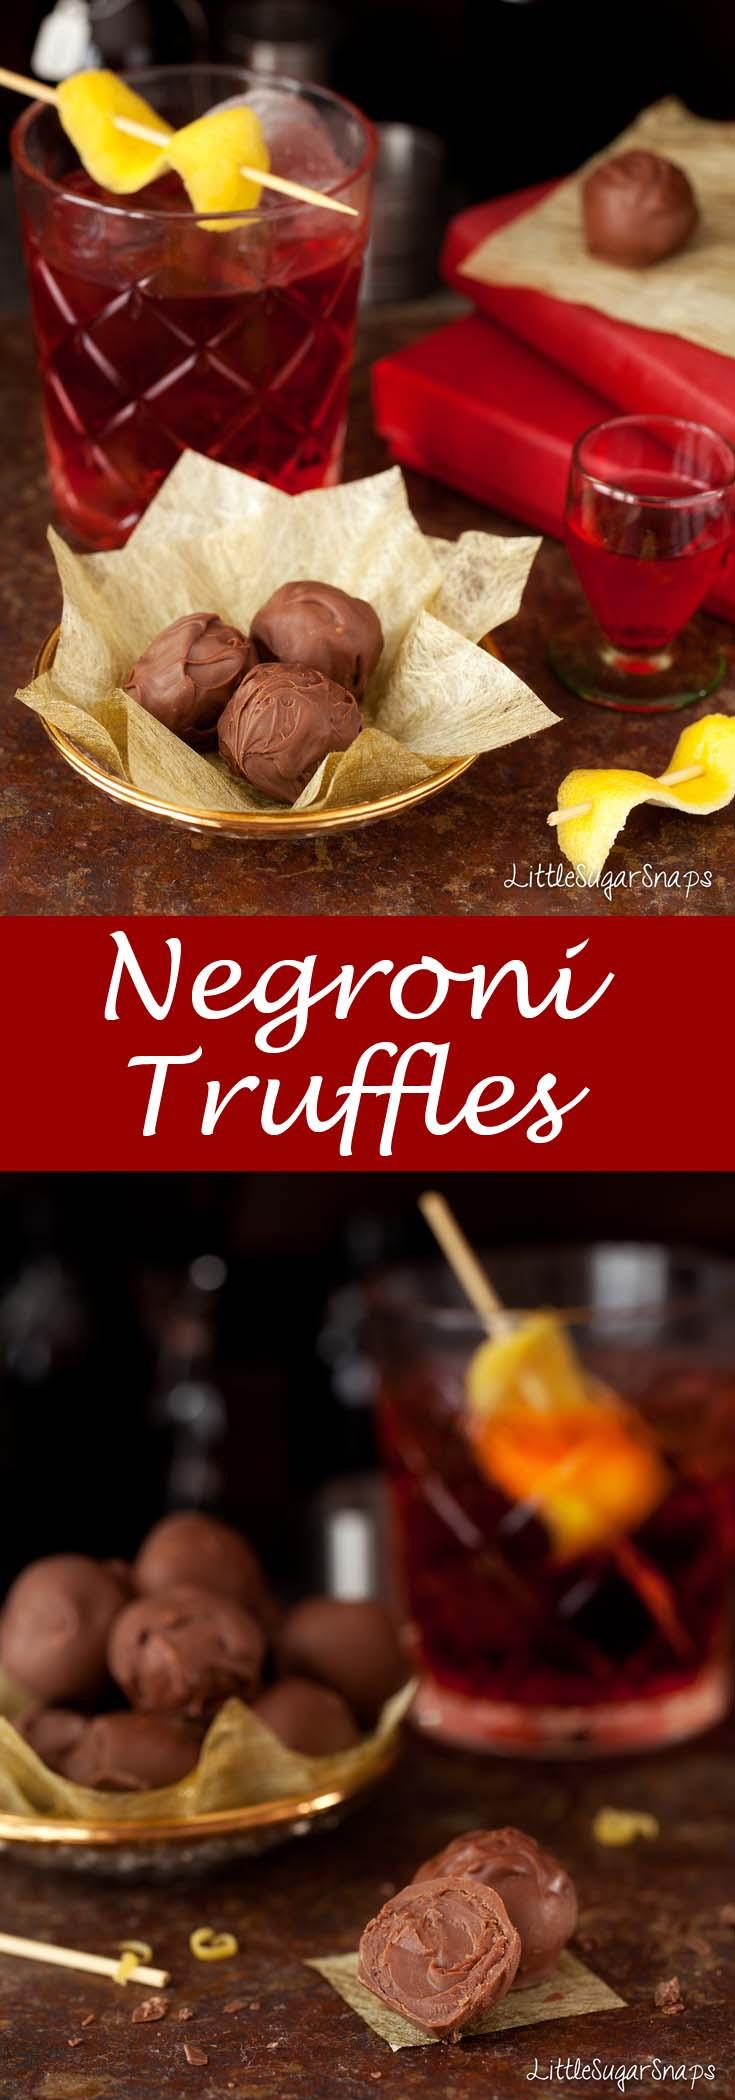 Negroni Truffles #negroni #chocolatetruffle #truffles #negronitruffle width=